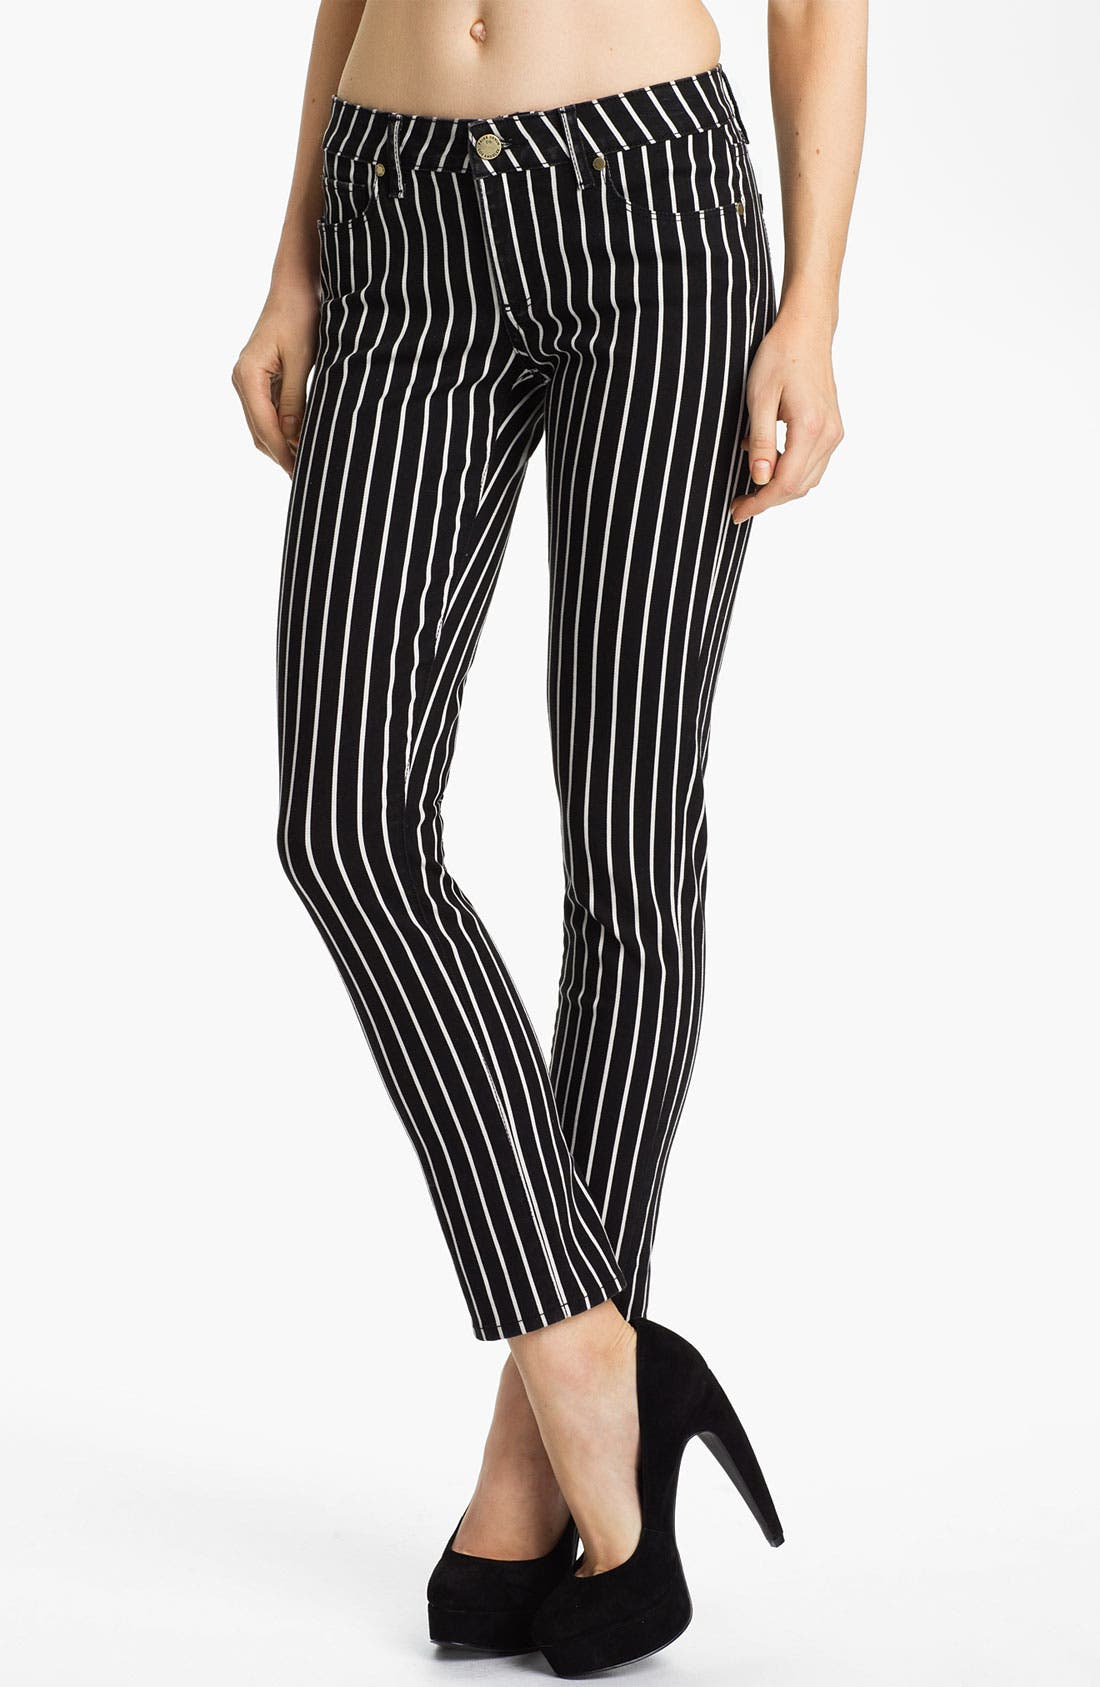 Main Image - Paige Denim 'Skyline' Skinny Stretch Ankle Jeans (Black/White)